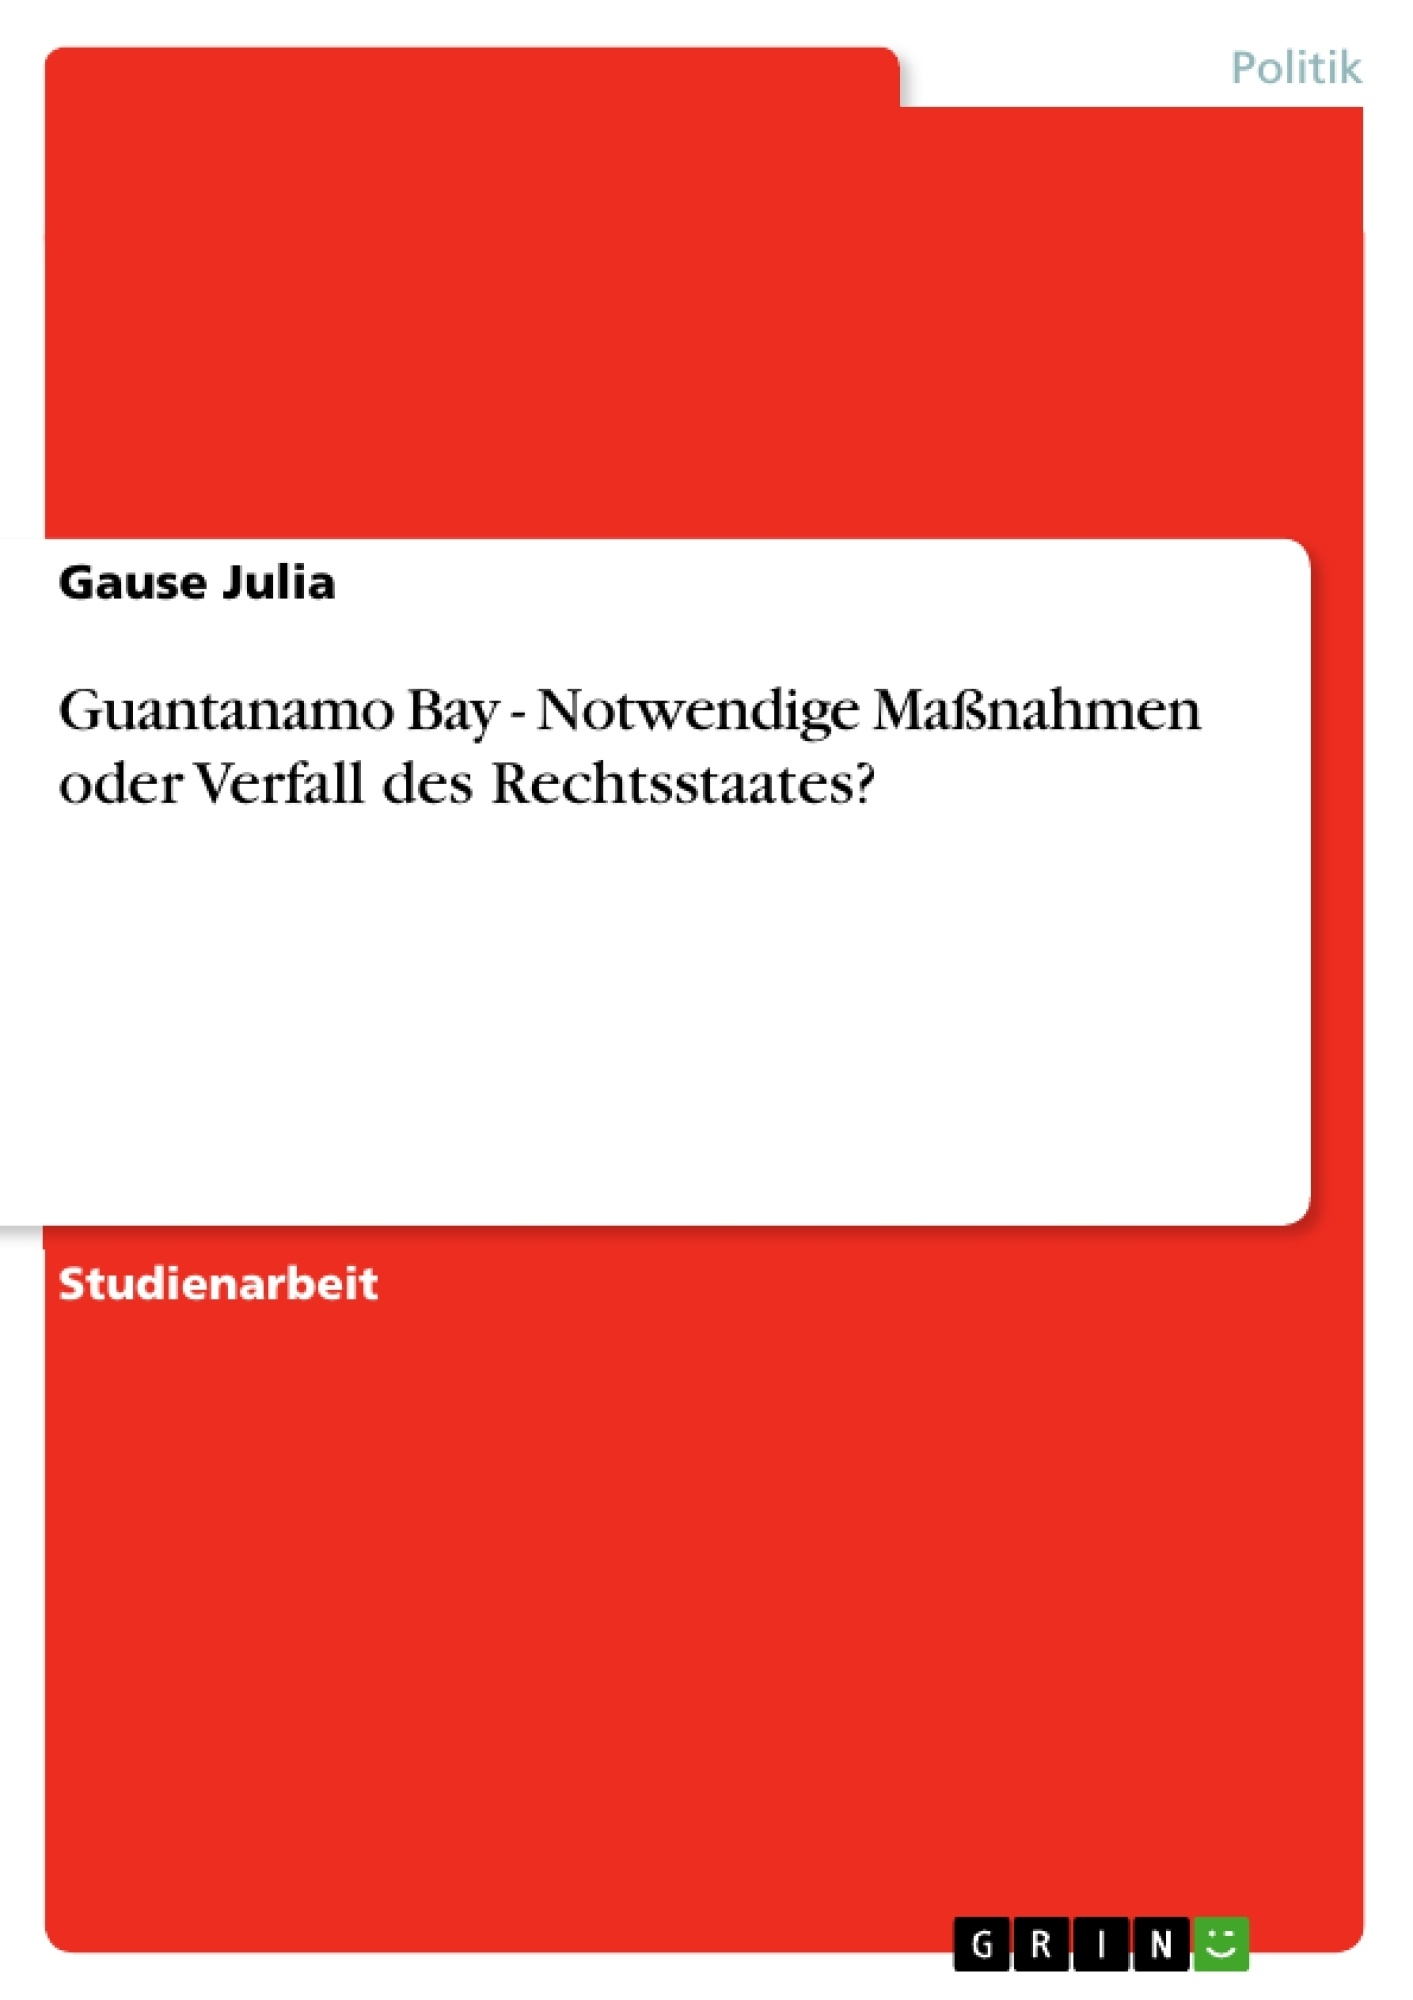 Titel: Guantanamo Bay - Notwendige Maßnahmen oder Verfall des Rechtsstaates?